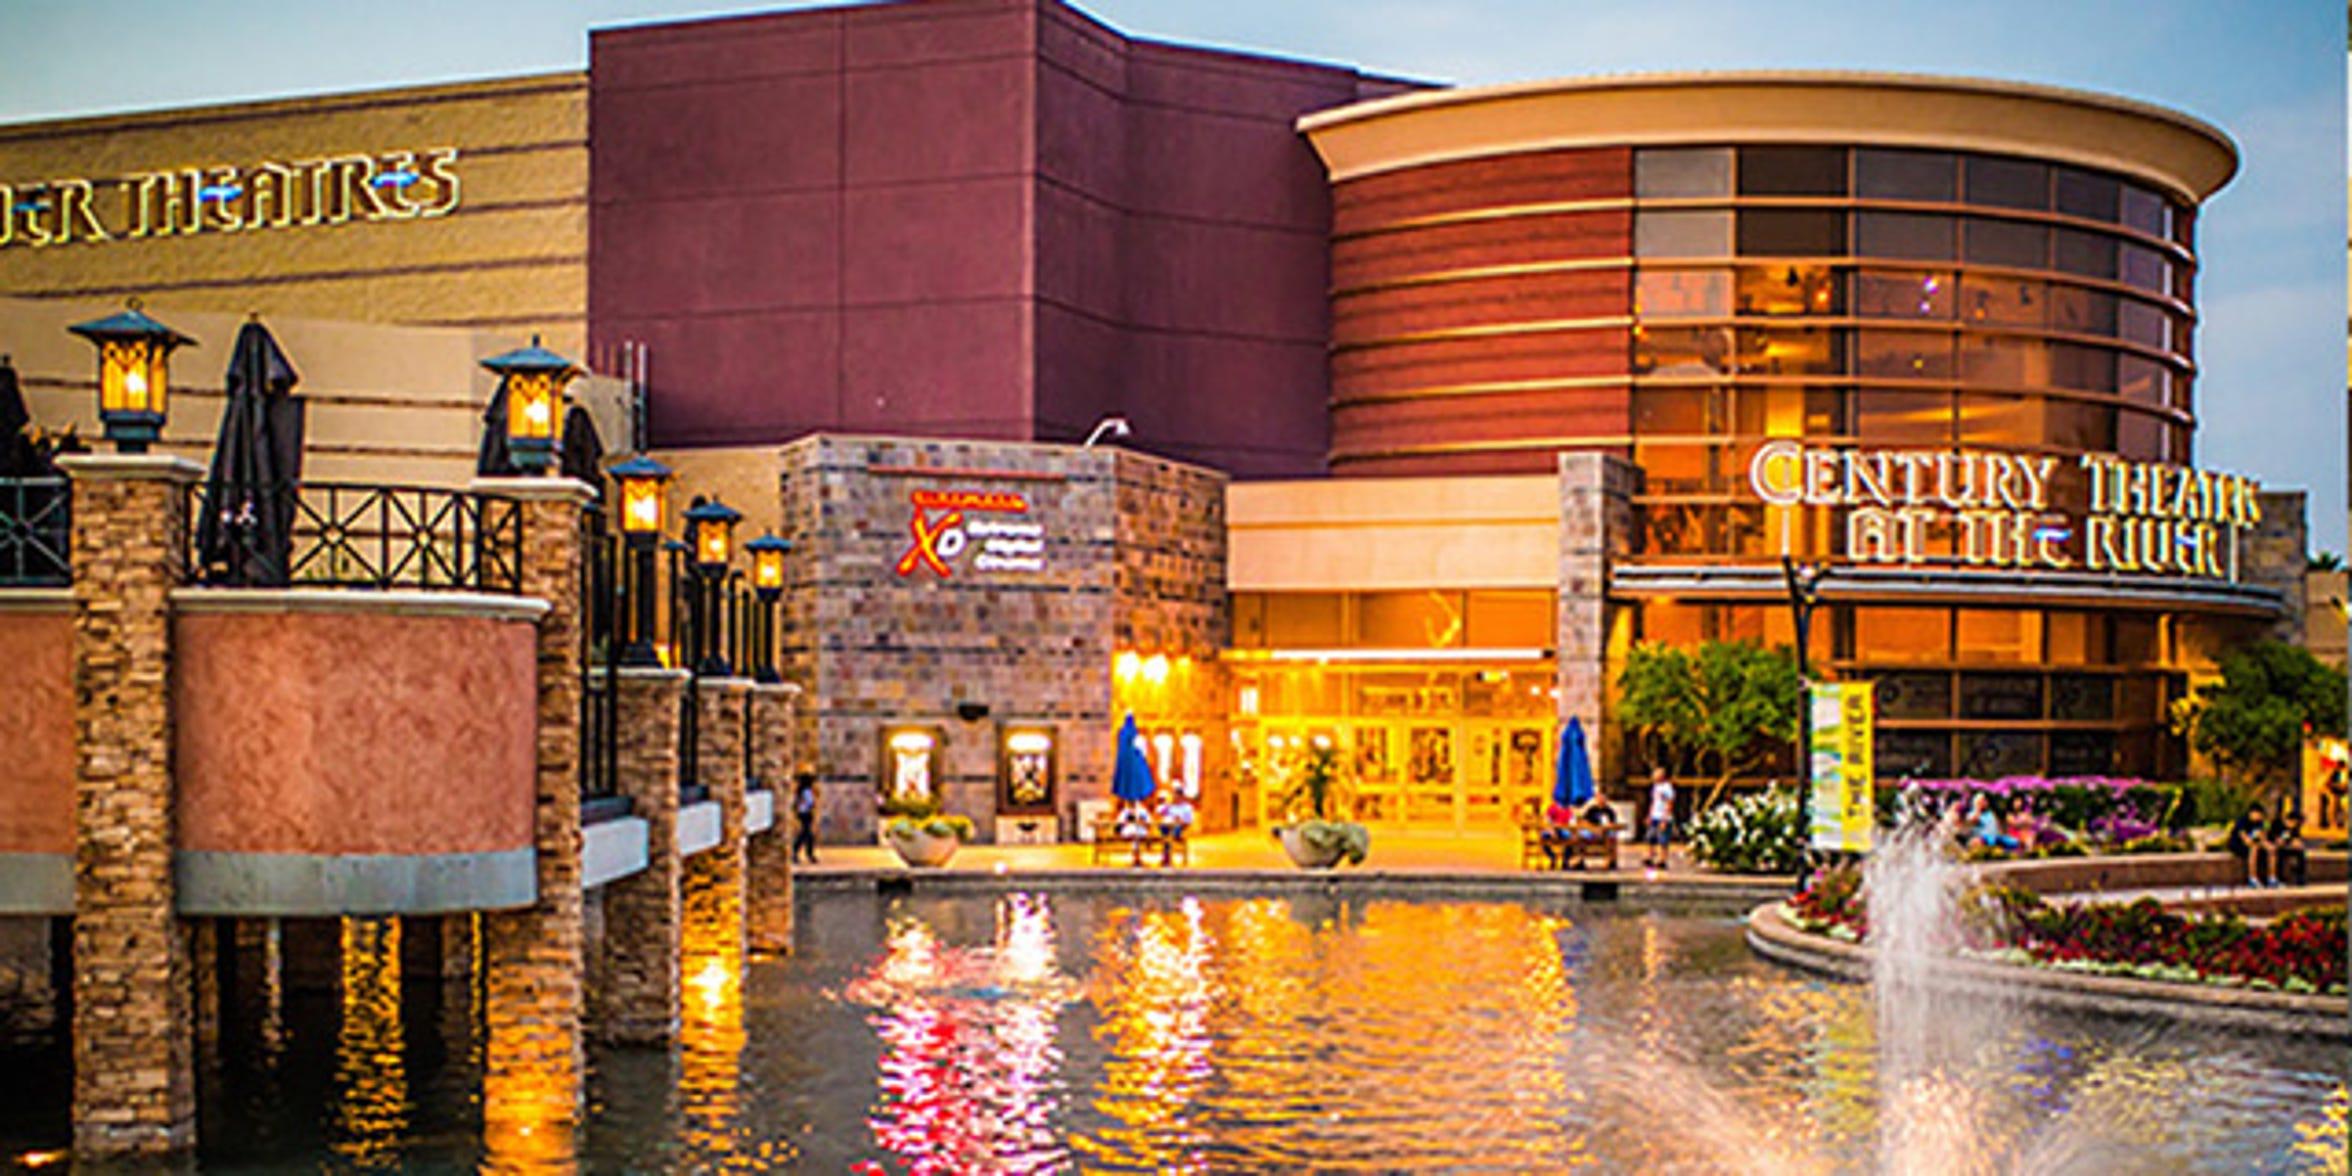 Century @ The River Cinemark Theatre.